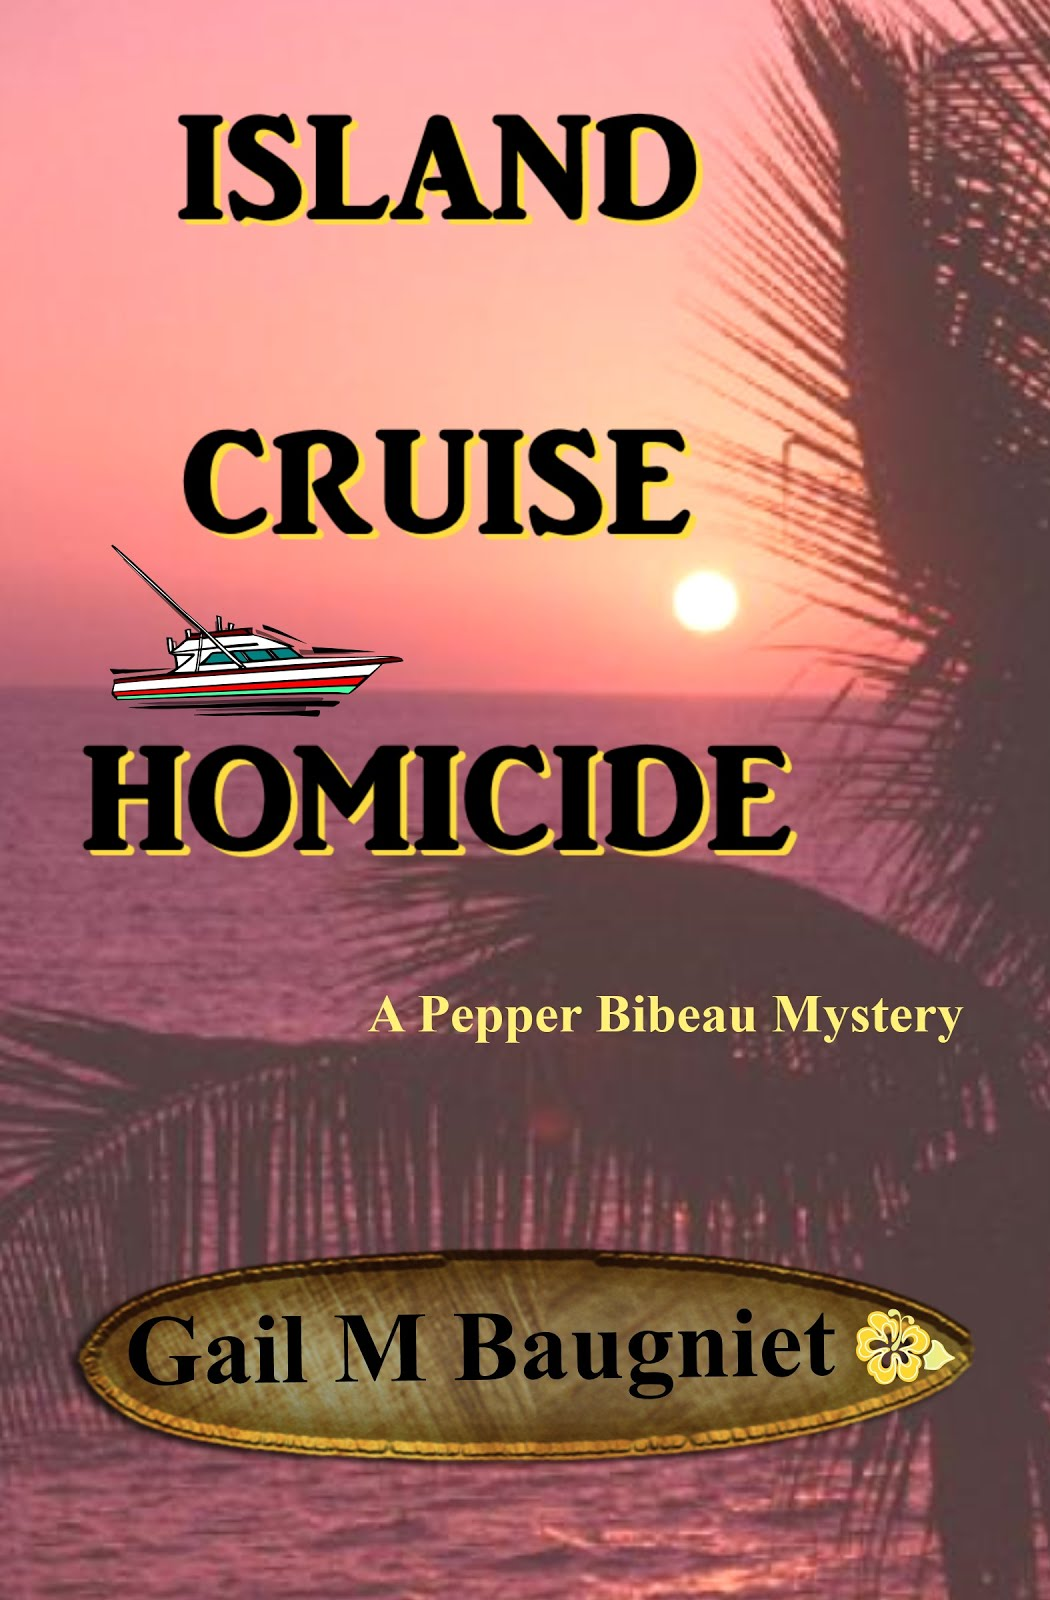 ISLAND CRUISE HOMICIDE